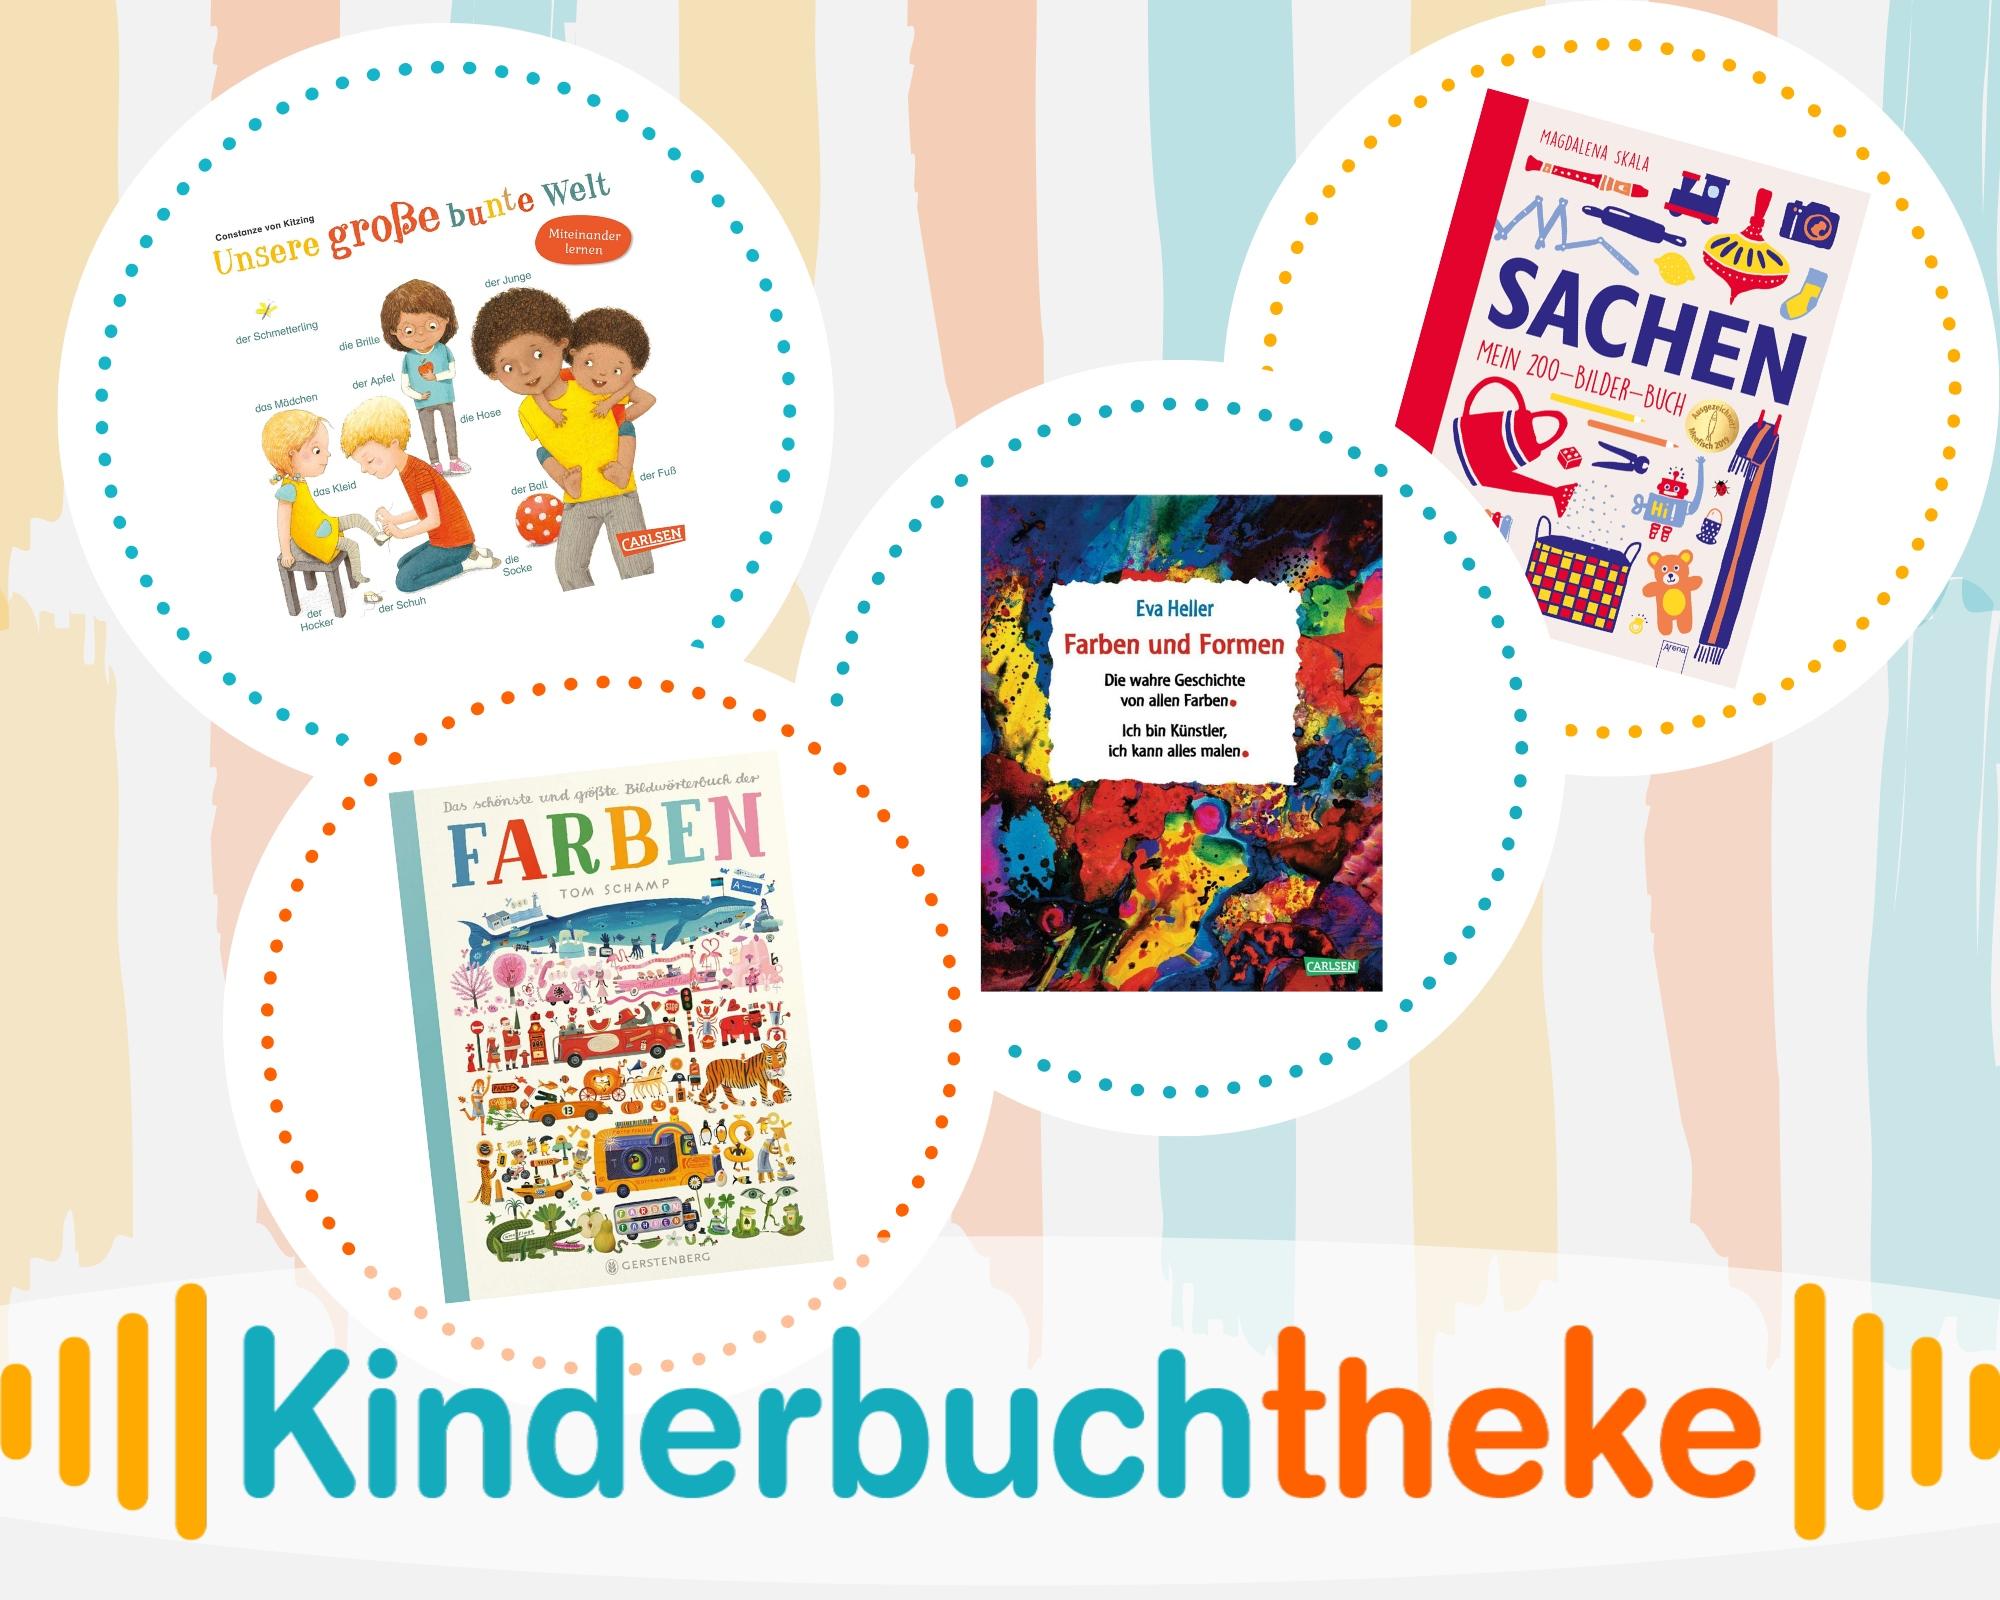 Kinderbuchtheke – Kunterbunte Farbenwelt